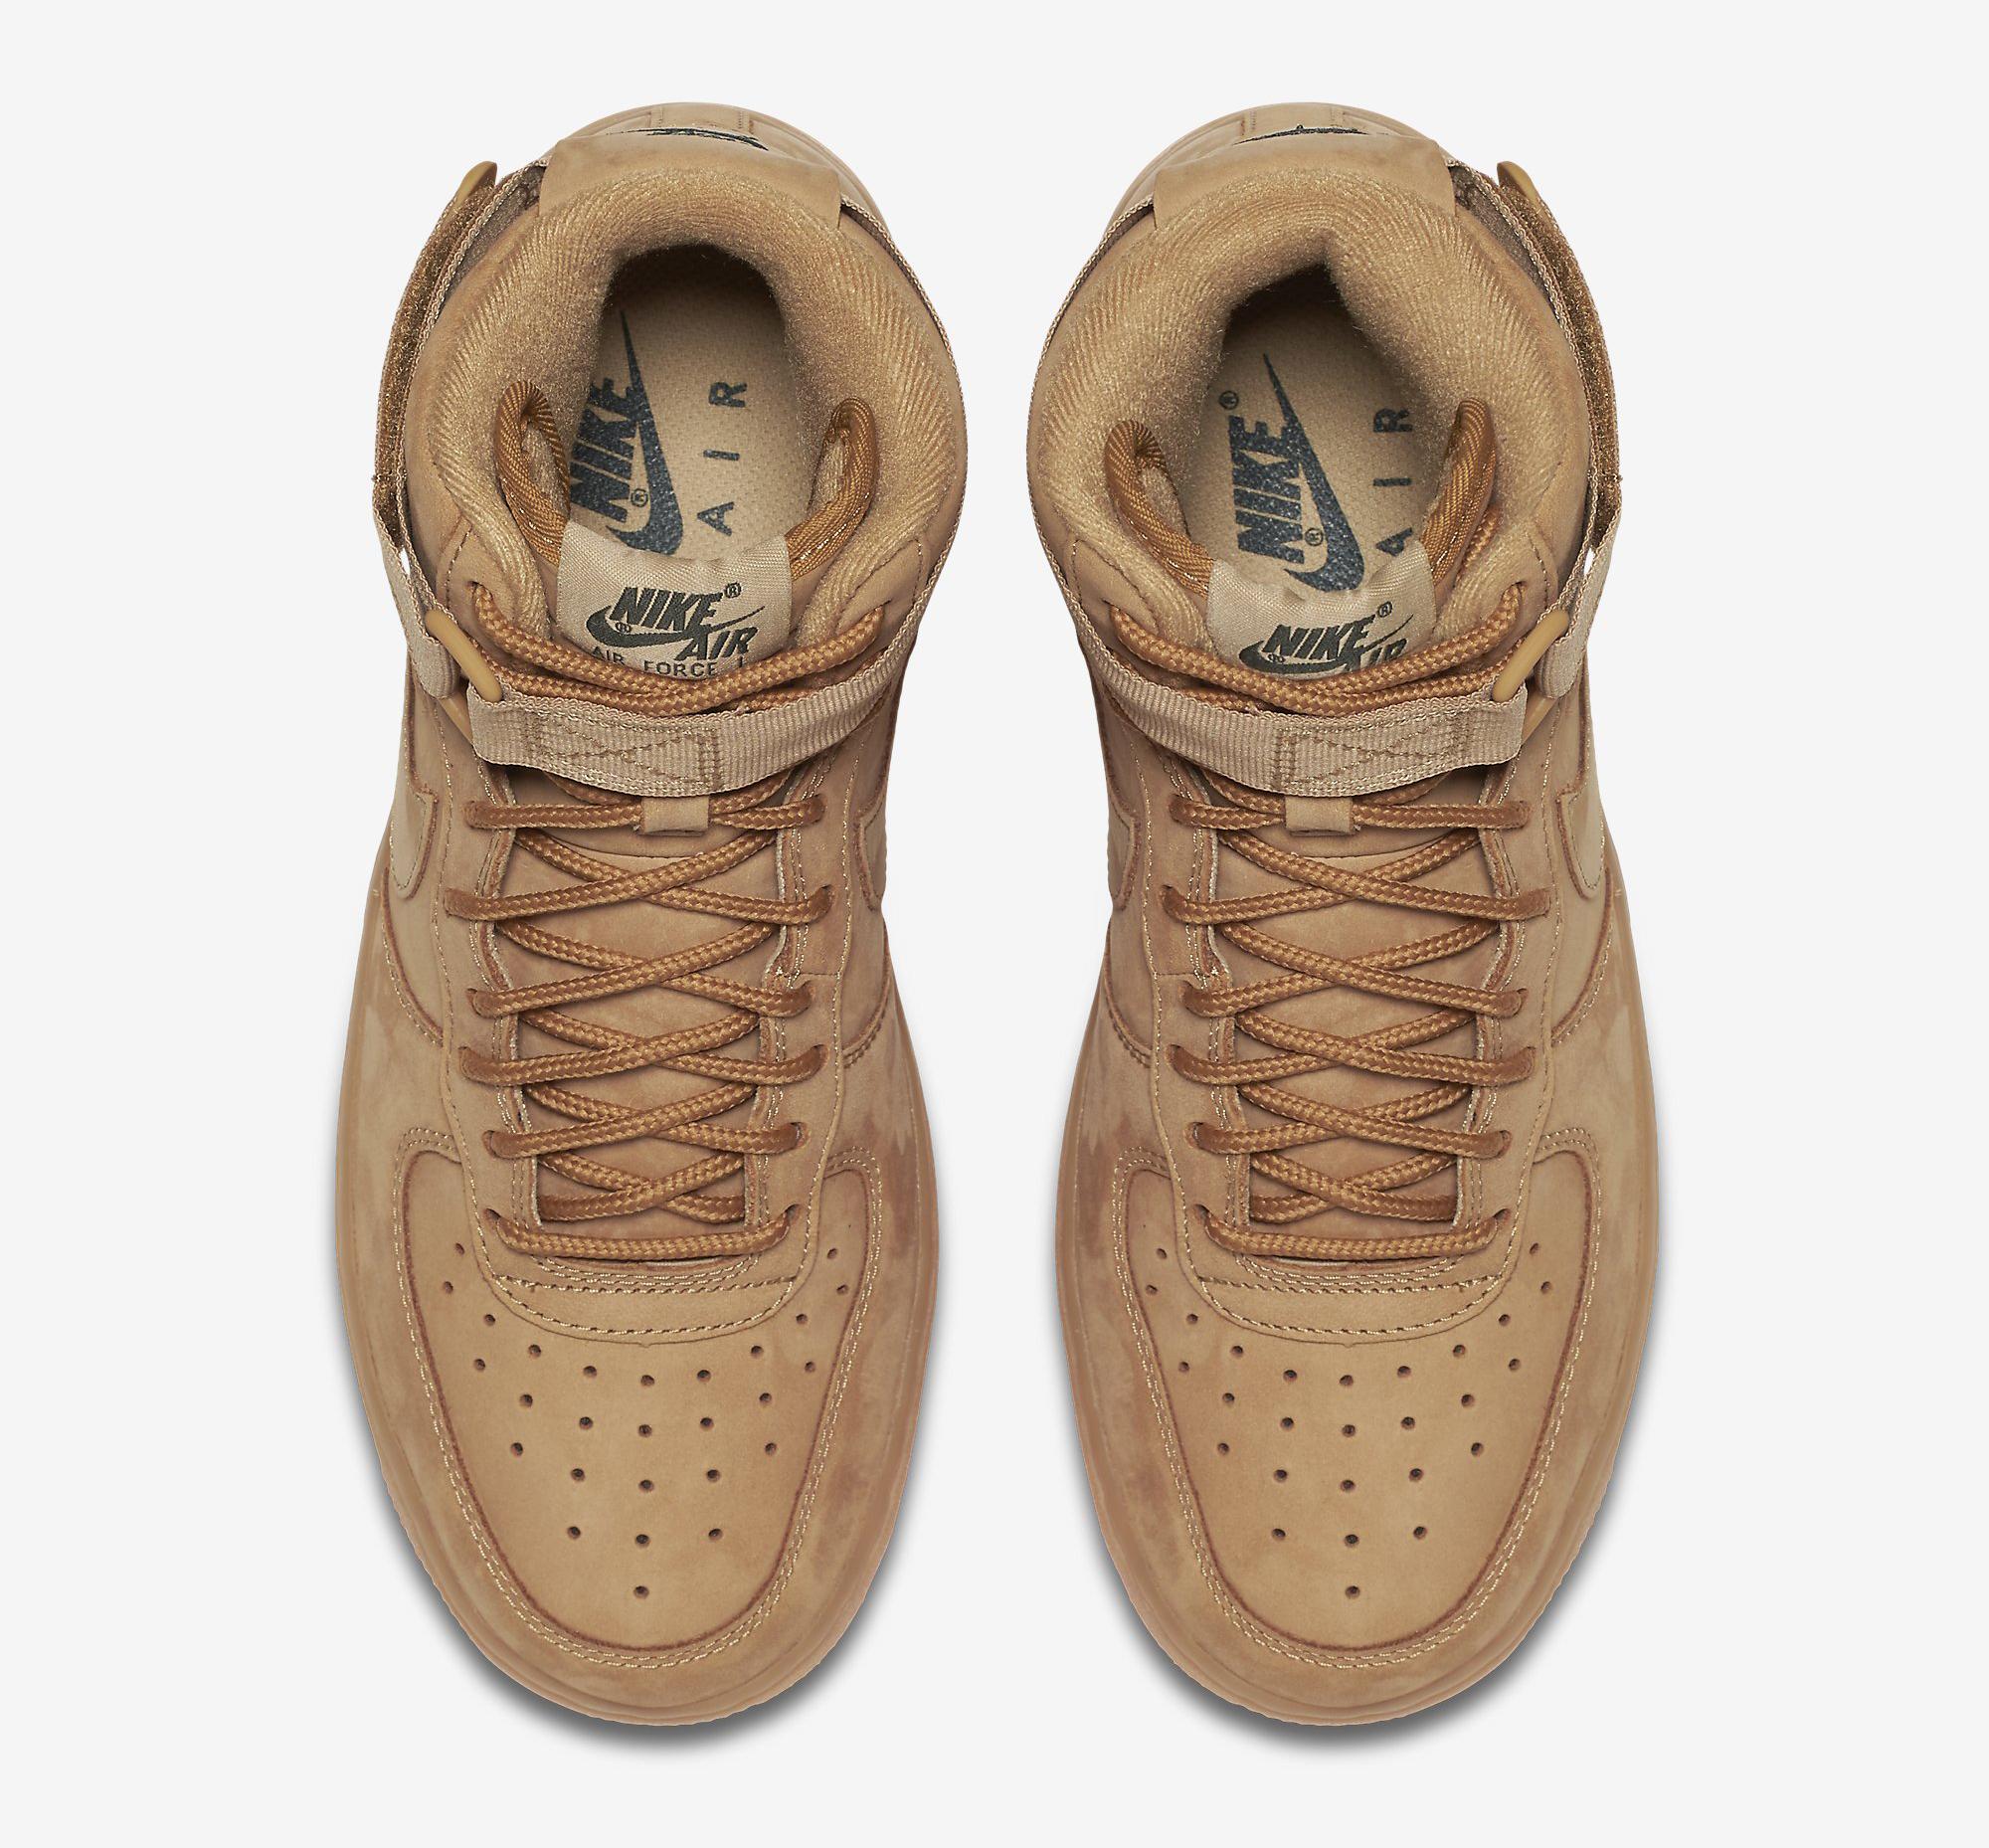 Wheat Nike Air Force 1 654440-200 Top